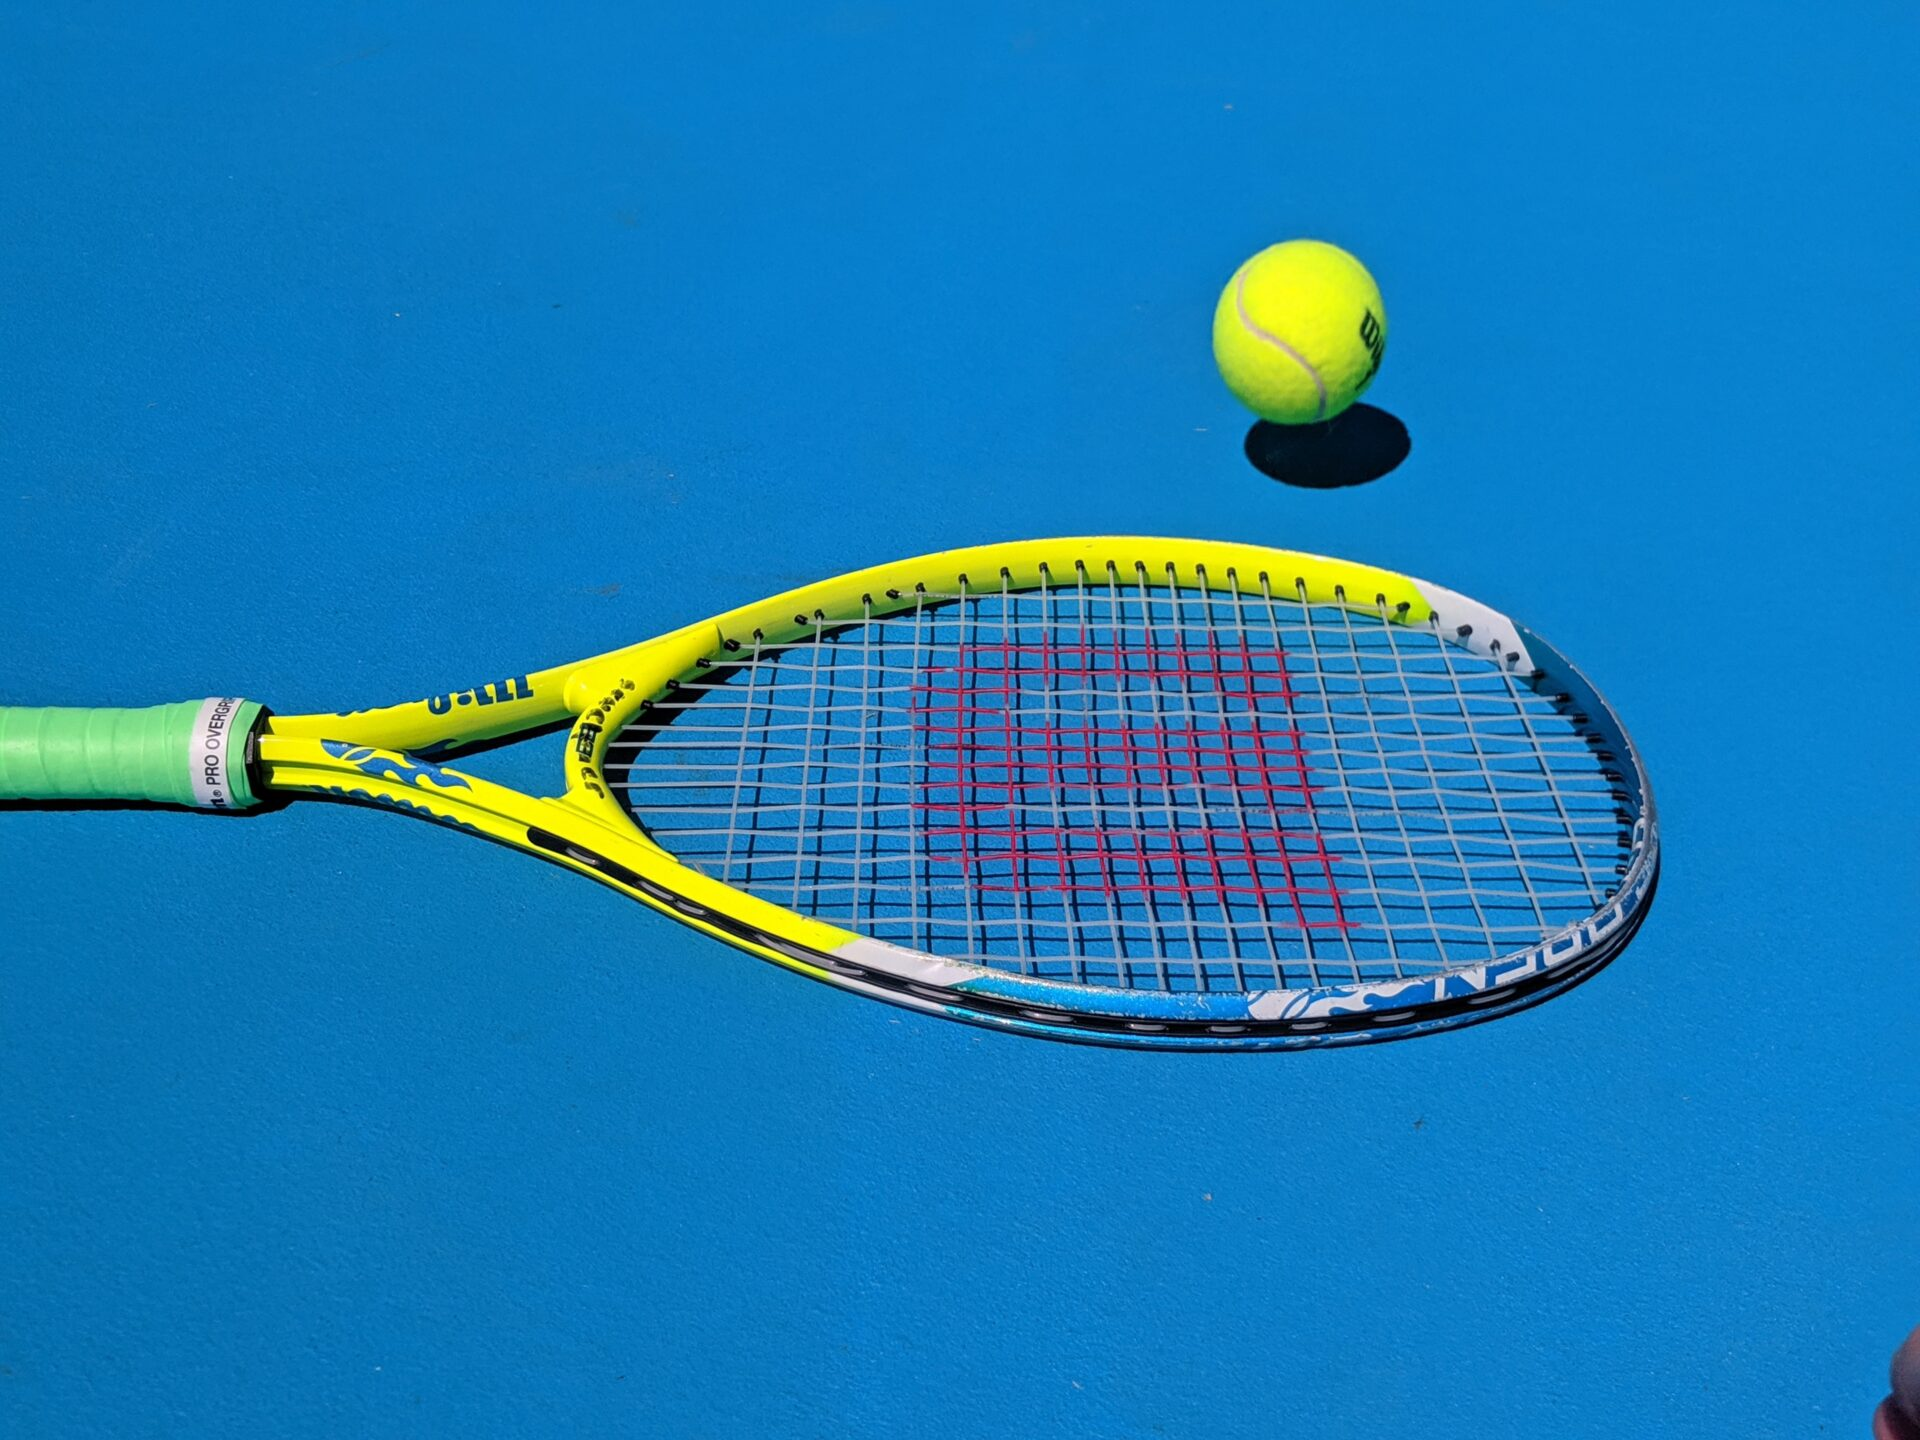 Rakieta i piłka do tenisa na niebieskim tle